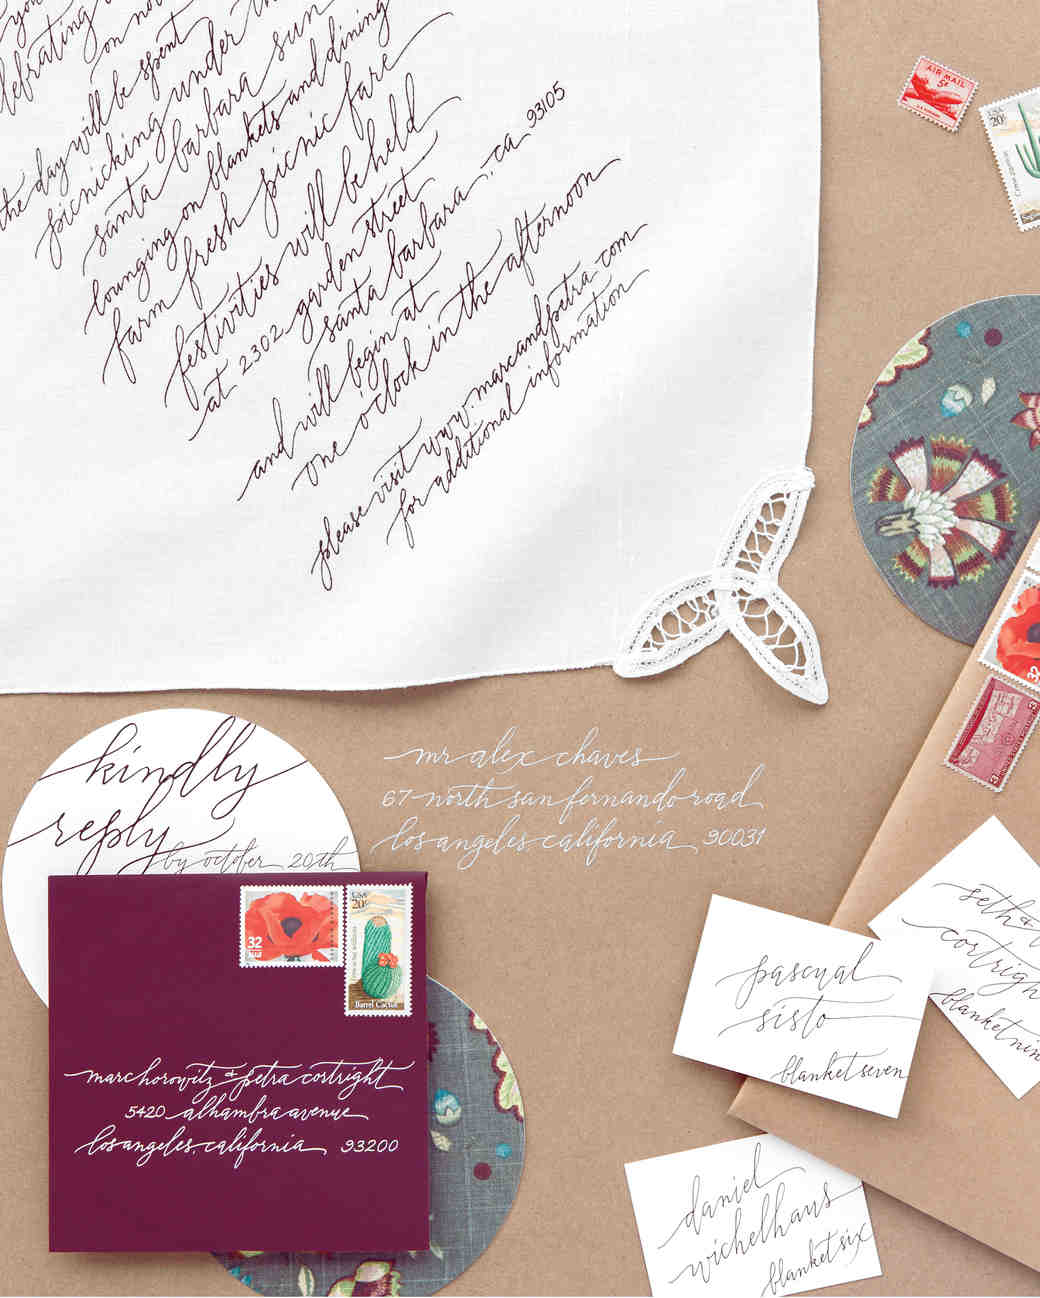 petra-marc-wedding-invite-full-frame-stylist-crop-s111812.jpg